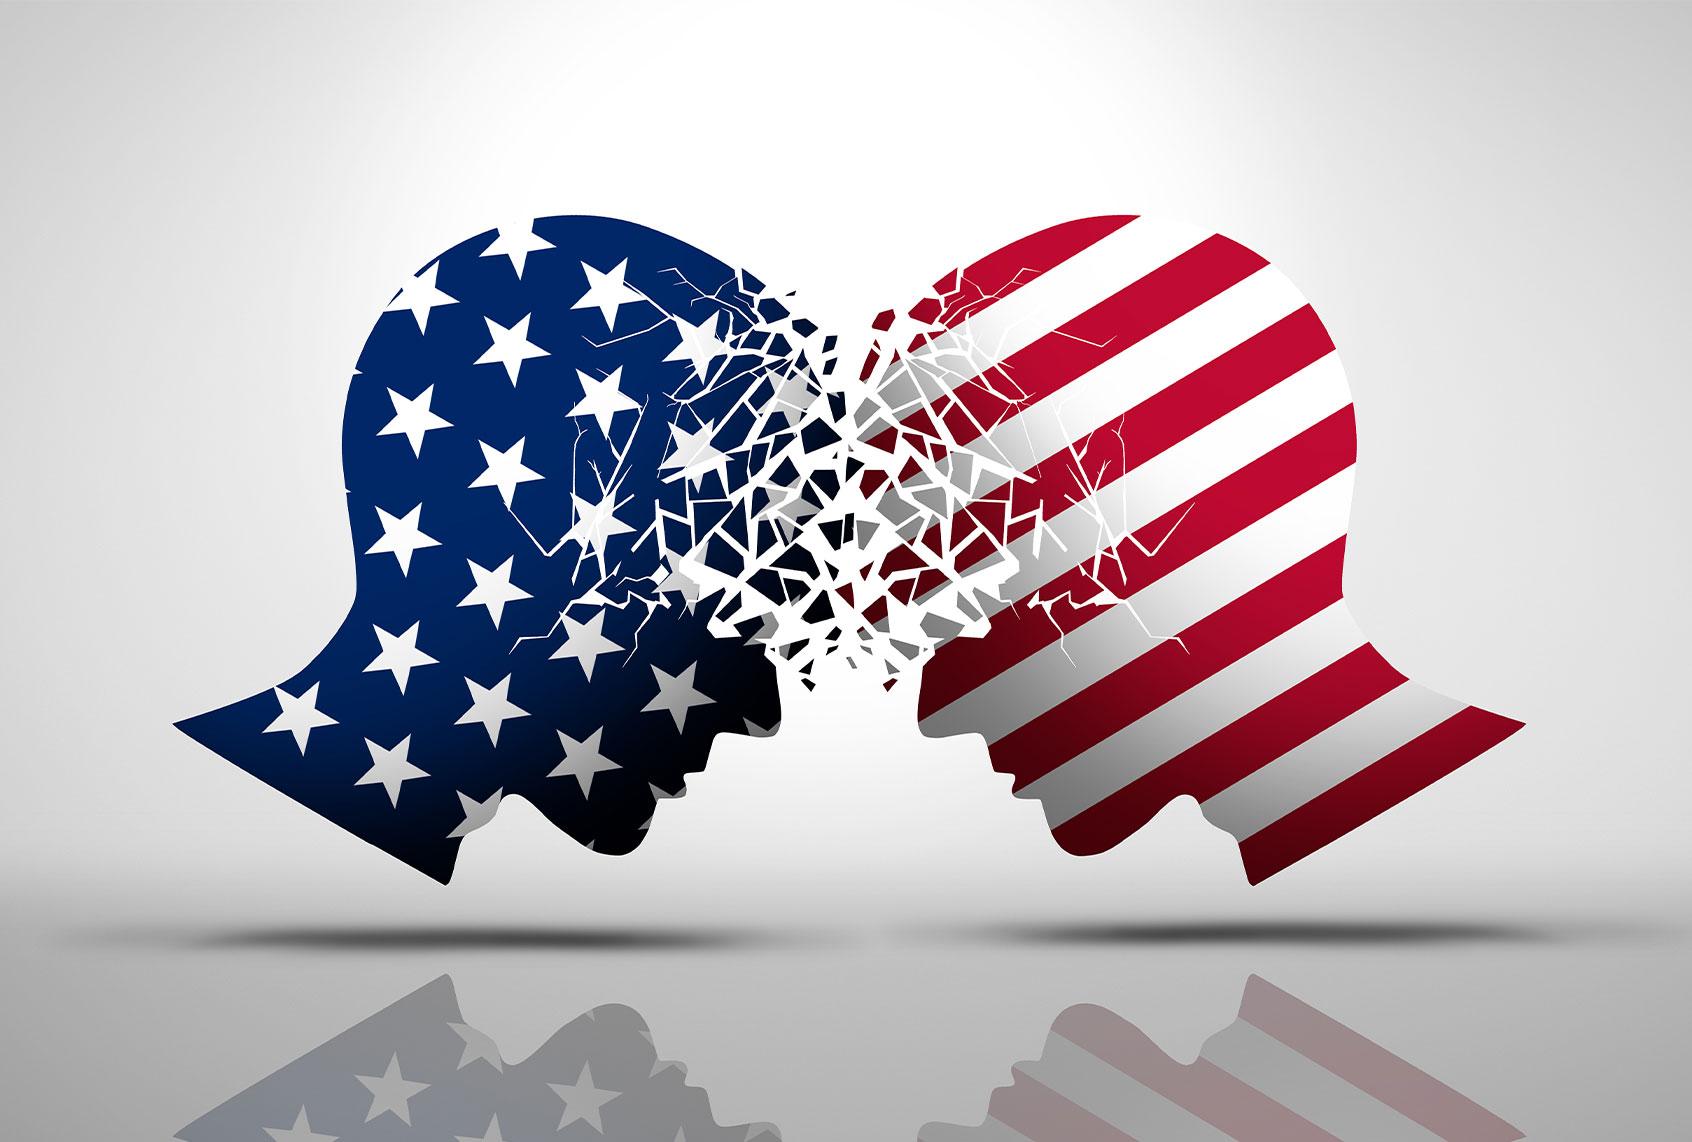 america-fighting-butting-heads-politics-